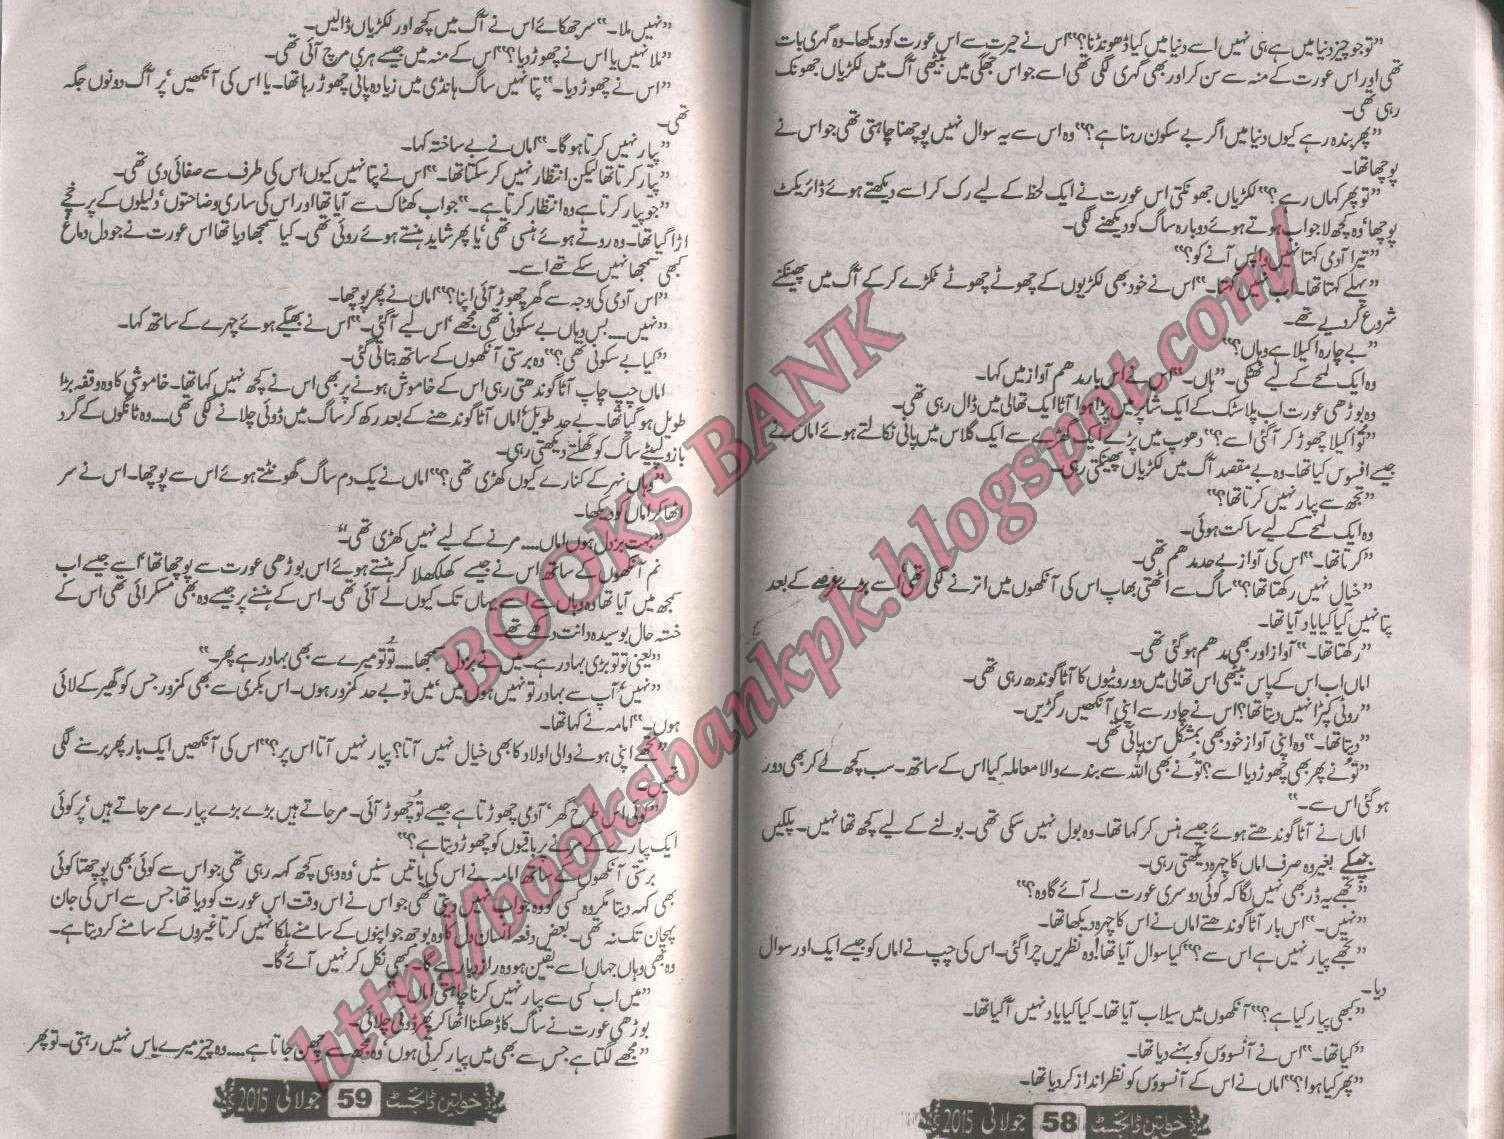 Kitab dost aab e hayat novel by umaira ahmed epi 9 online reading